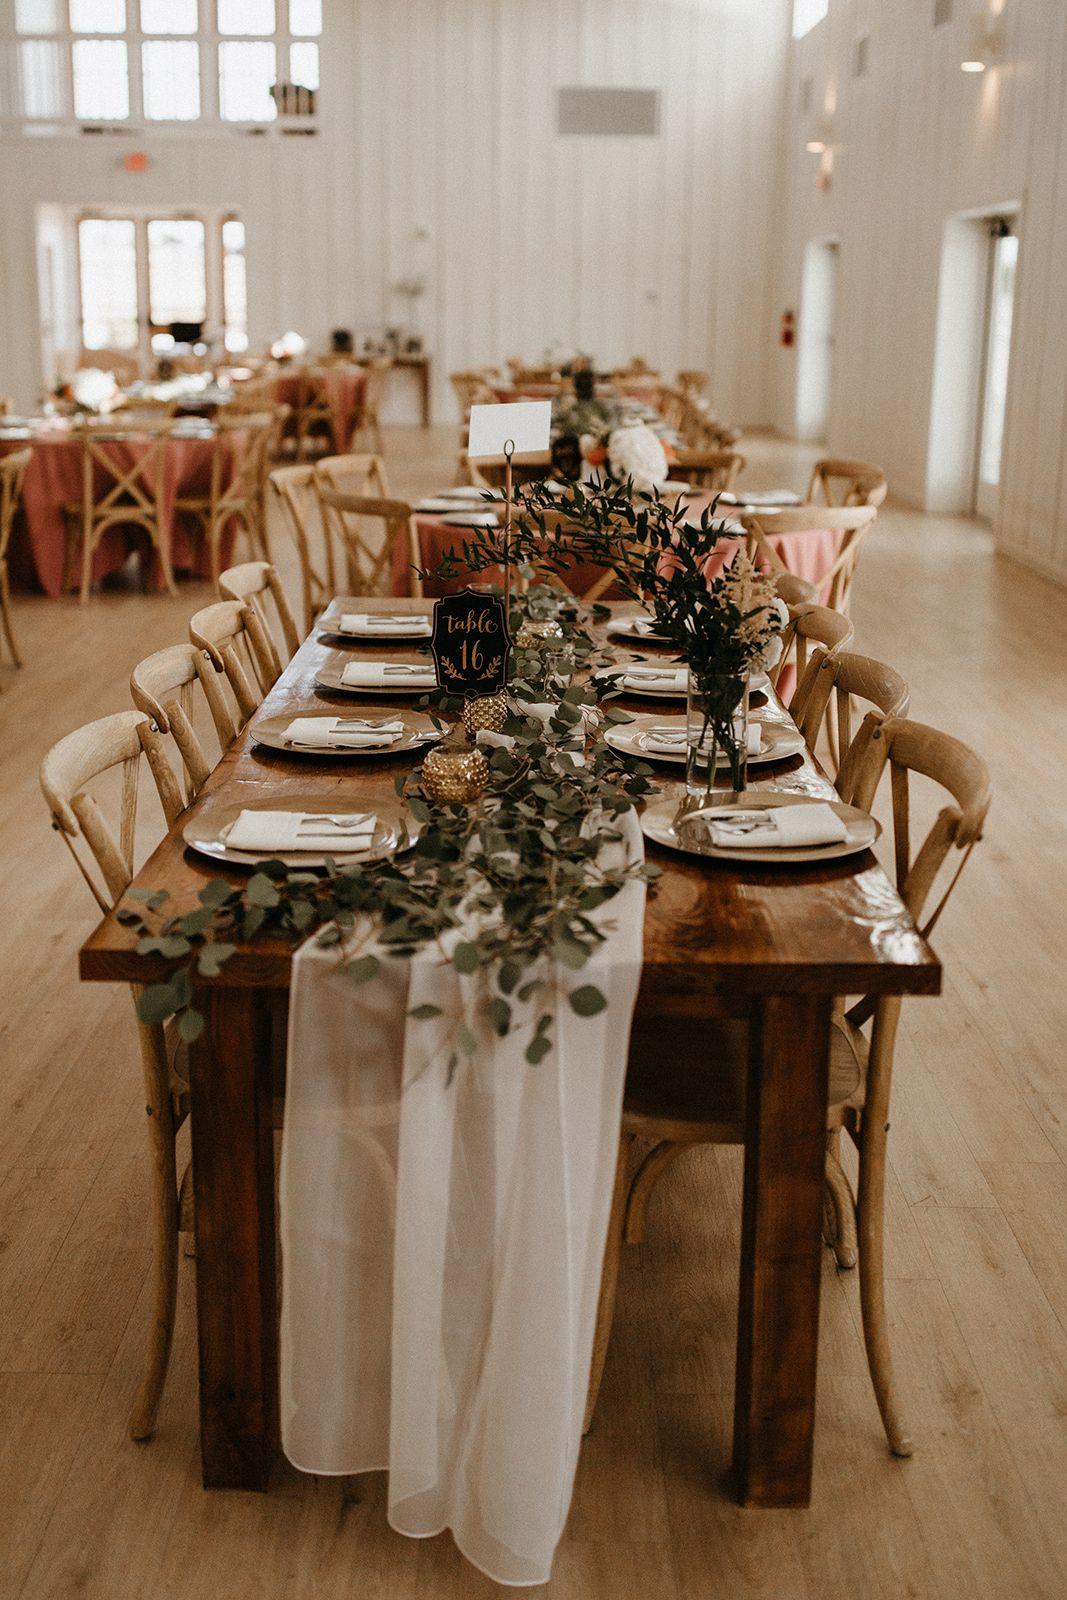 Modern wedding decor images  Rustic Modern Spring Texas Wedding Venue Rustic Modern Wedding